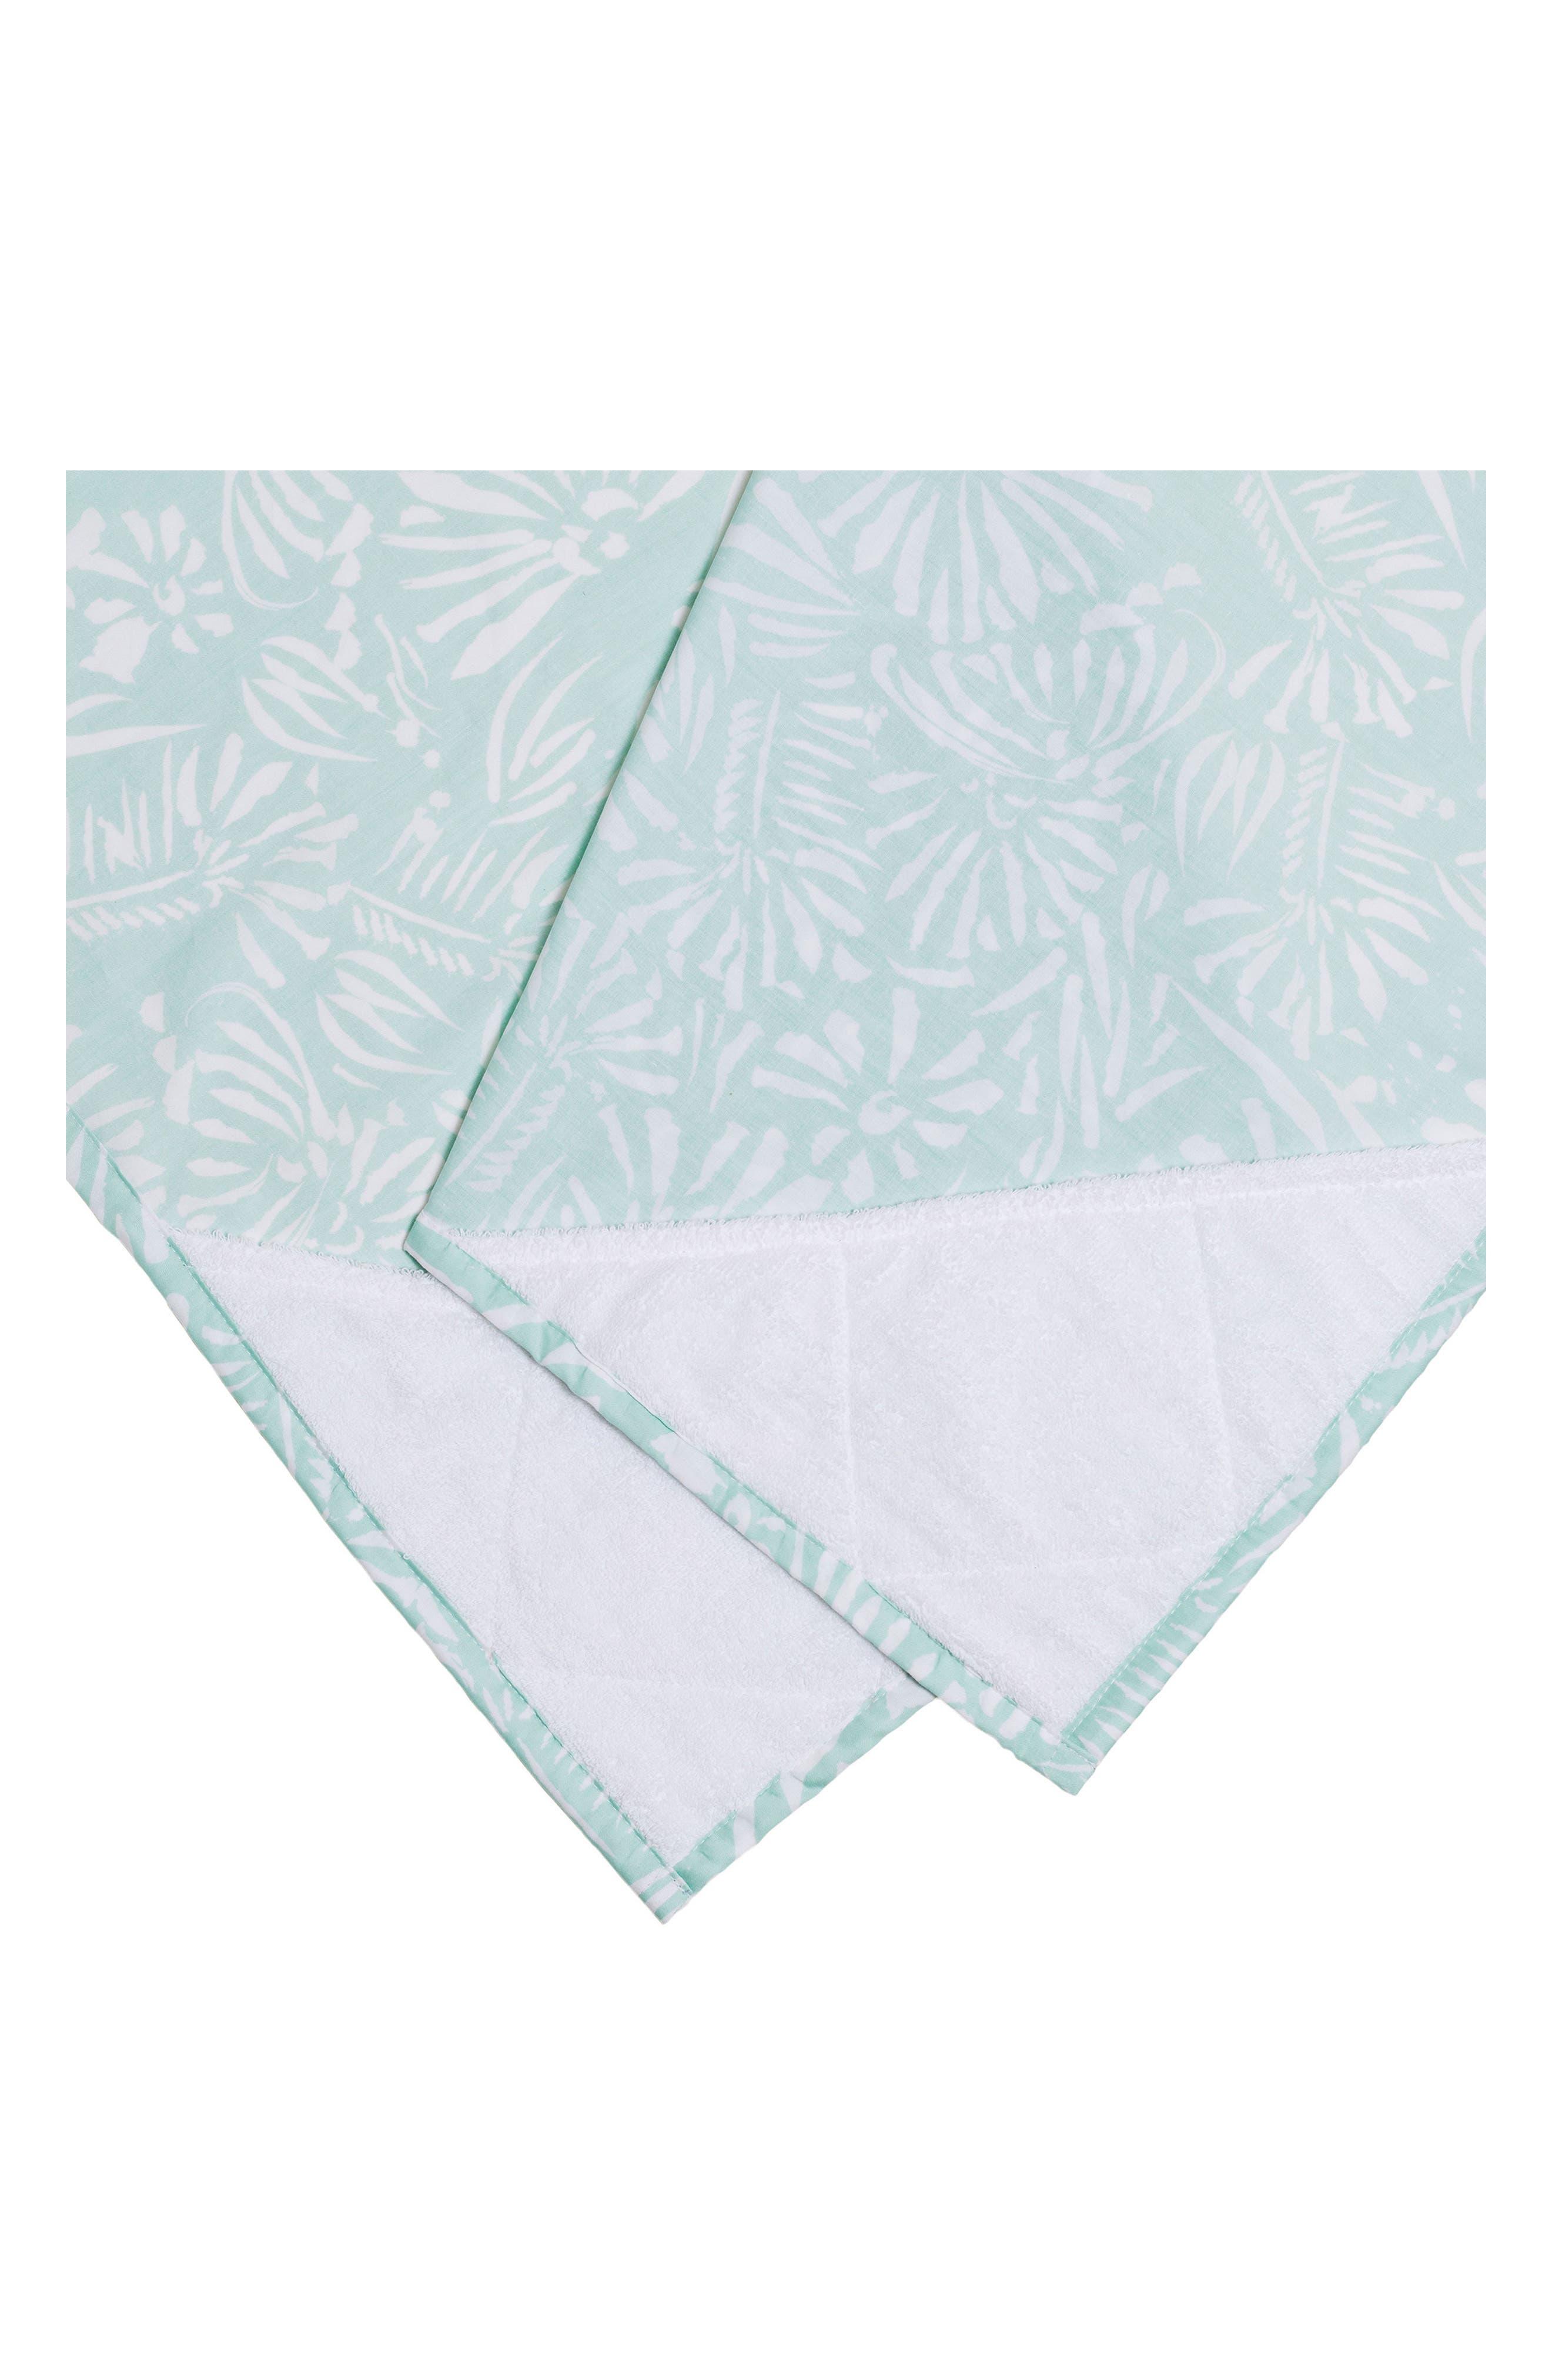 Nursing Cover & Burp Cloth Set,                             Alternate thumbnail 2, color,                             400